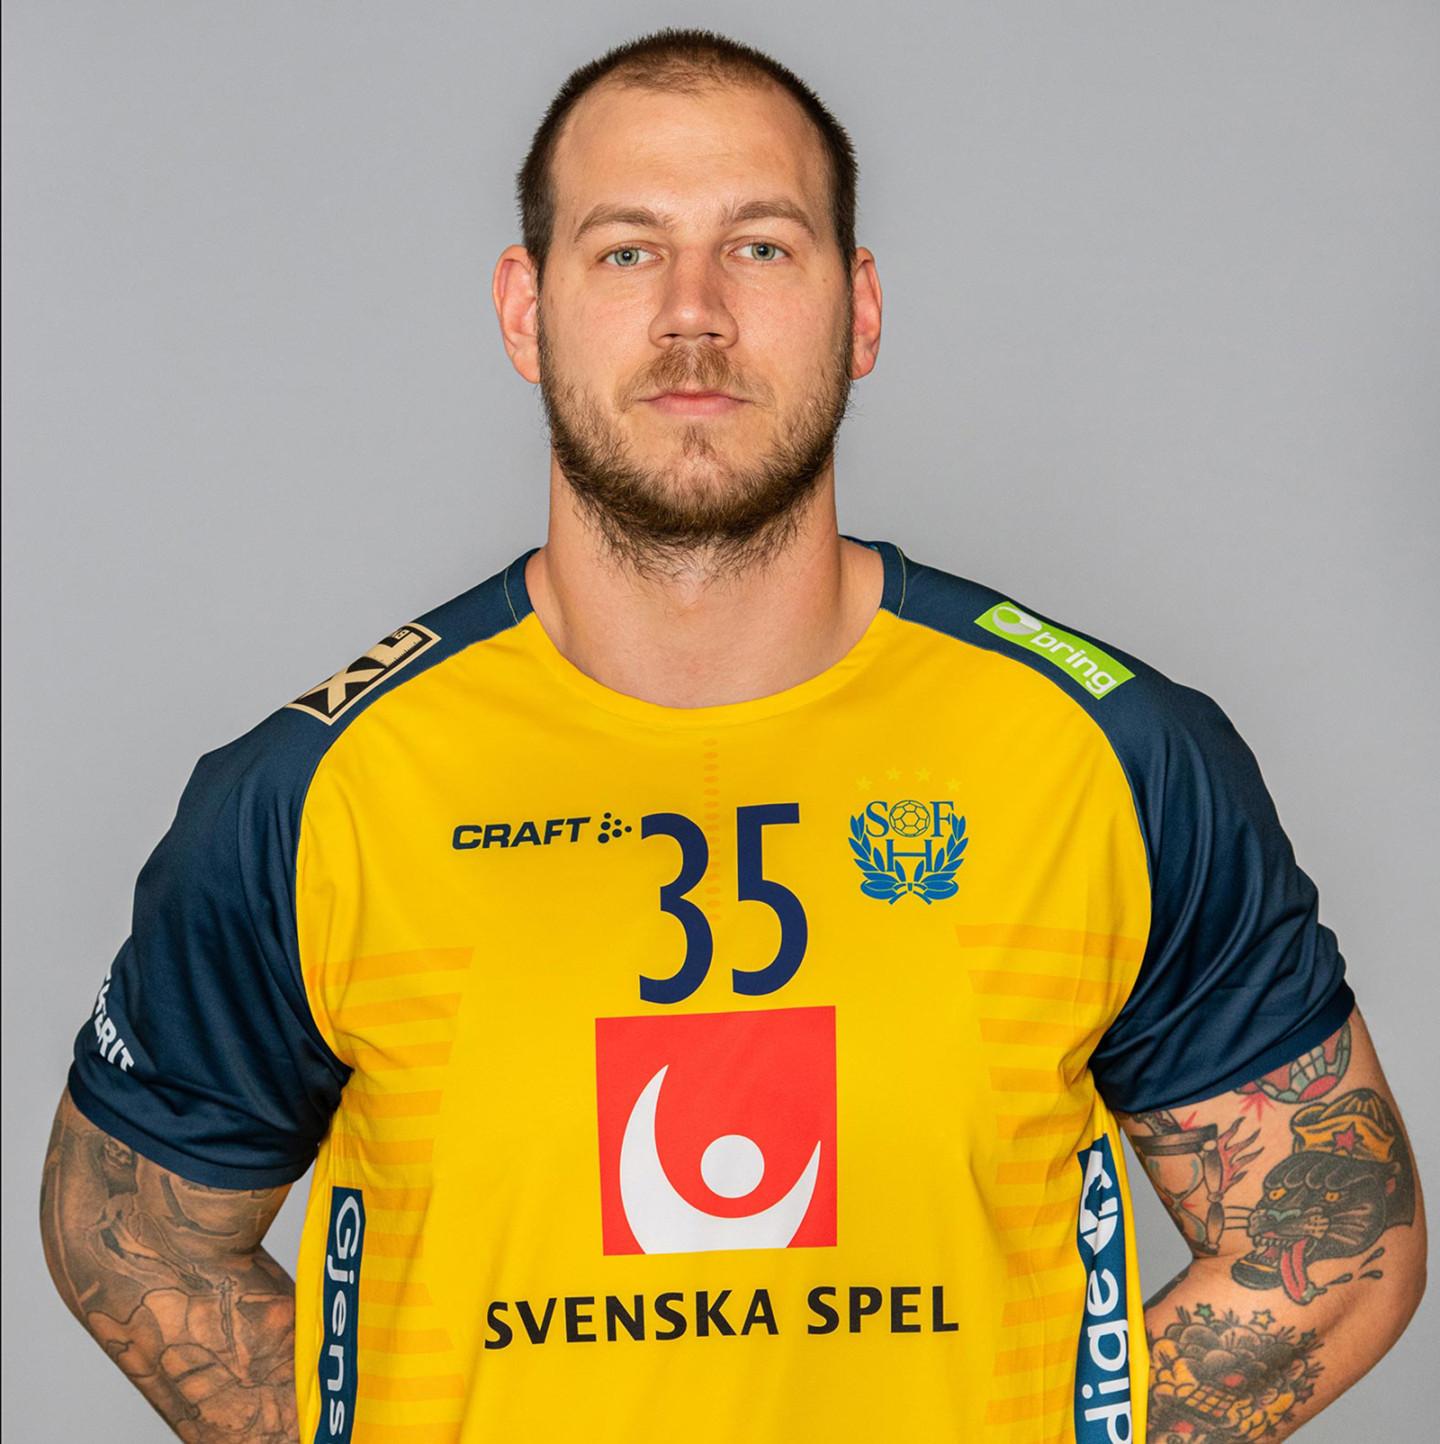 35 Andreas Nilsson